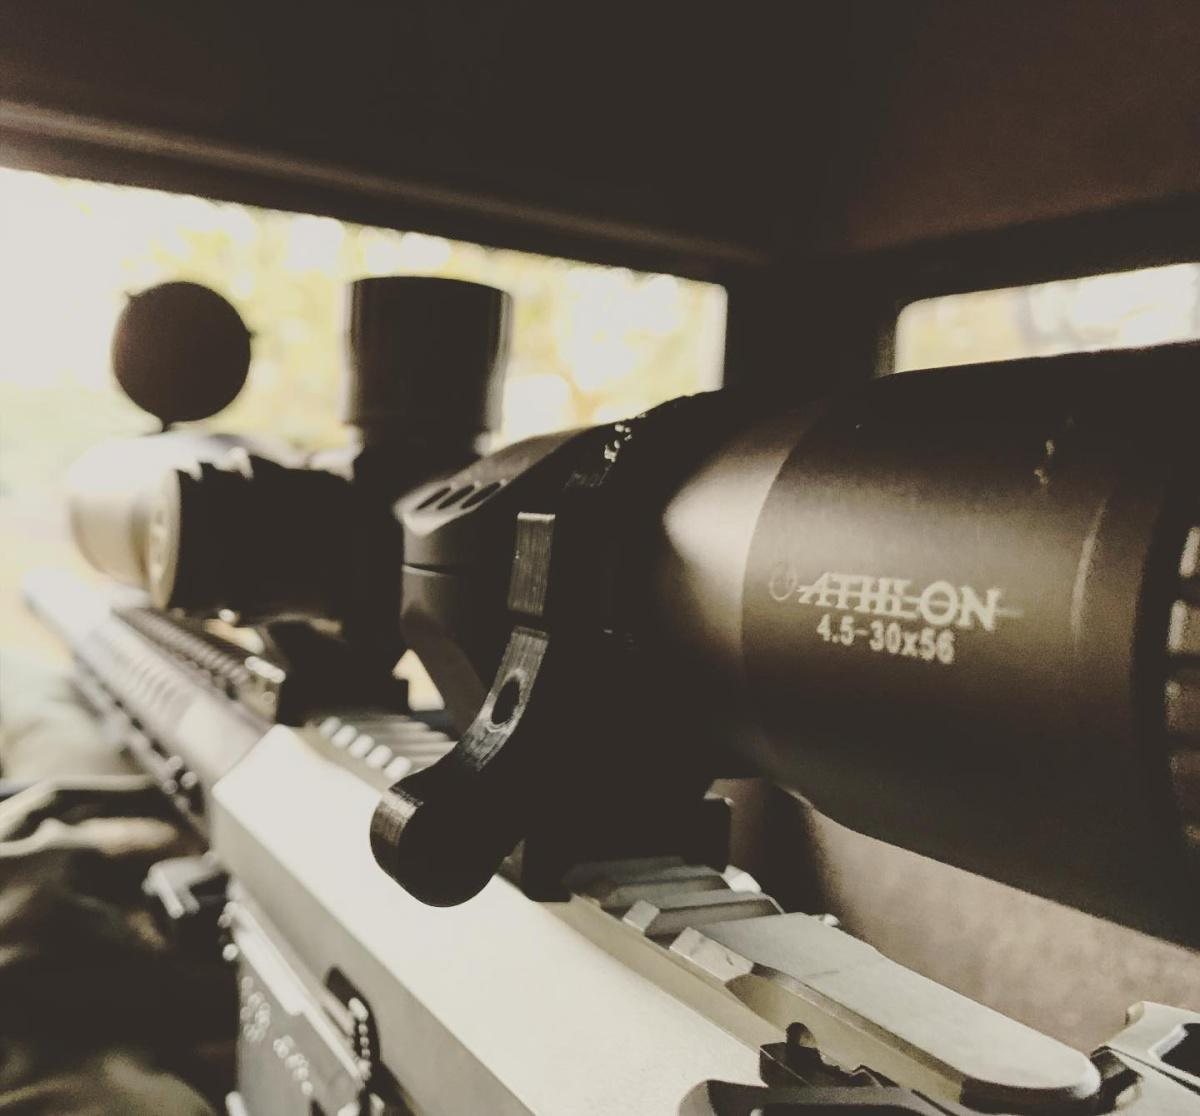 Advanced Shooting Solutions